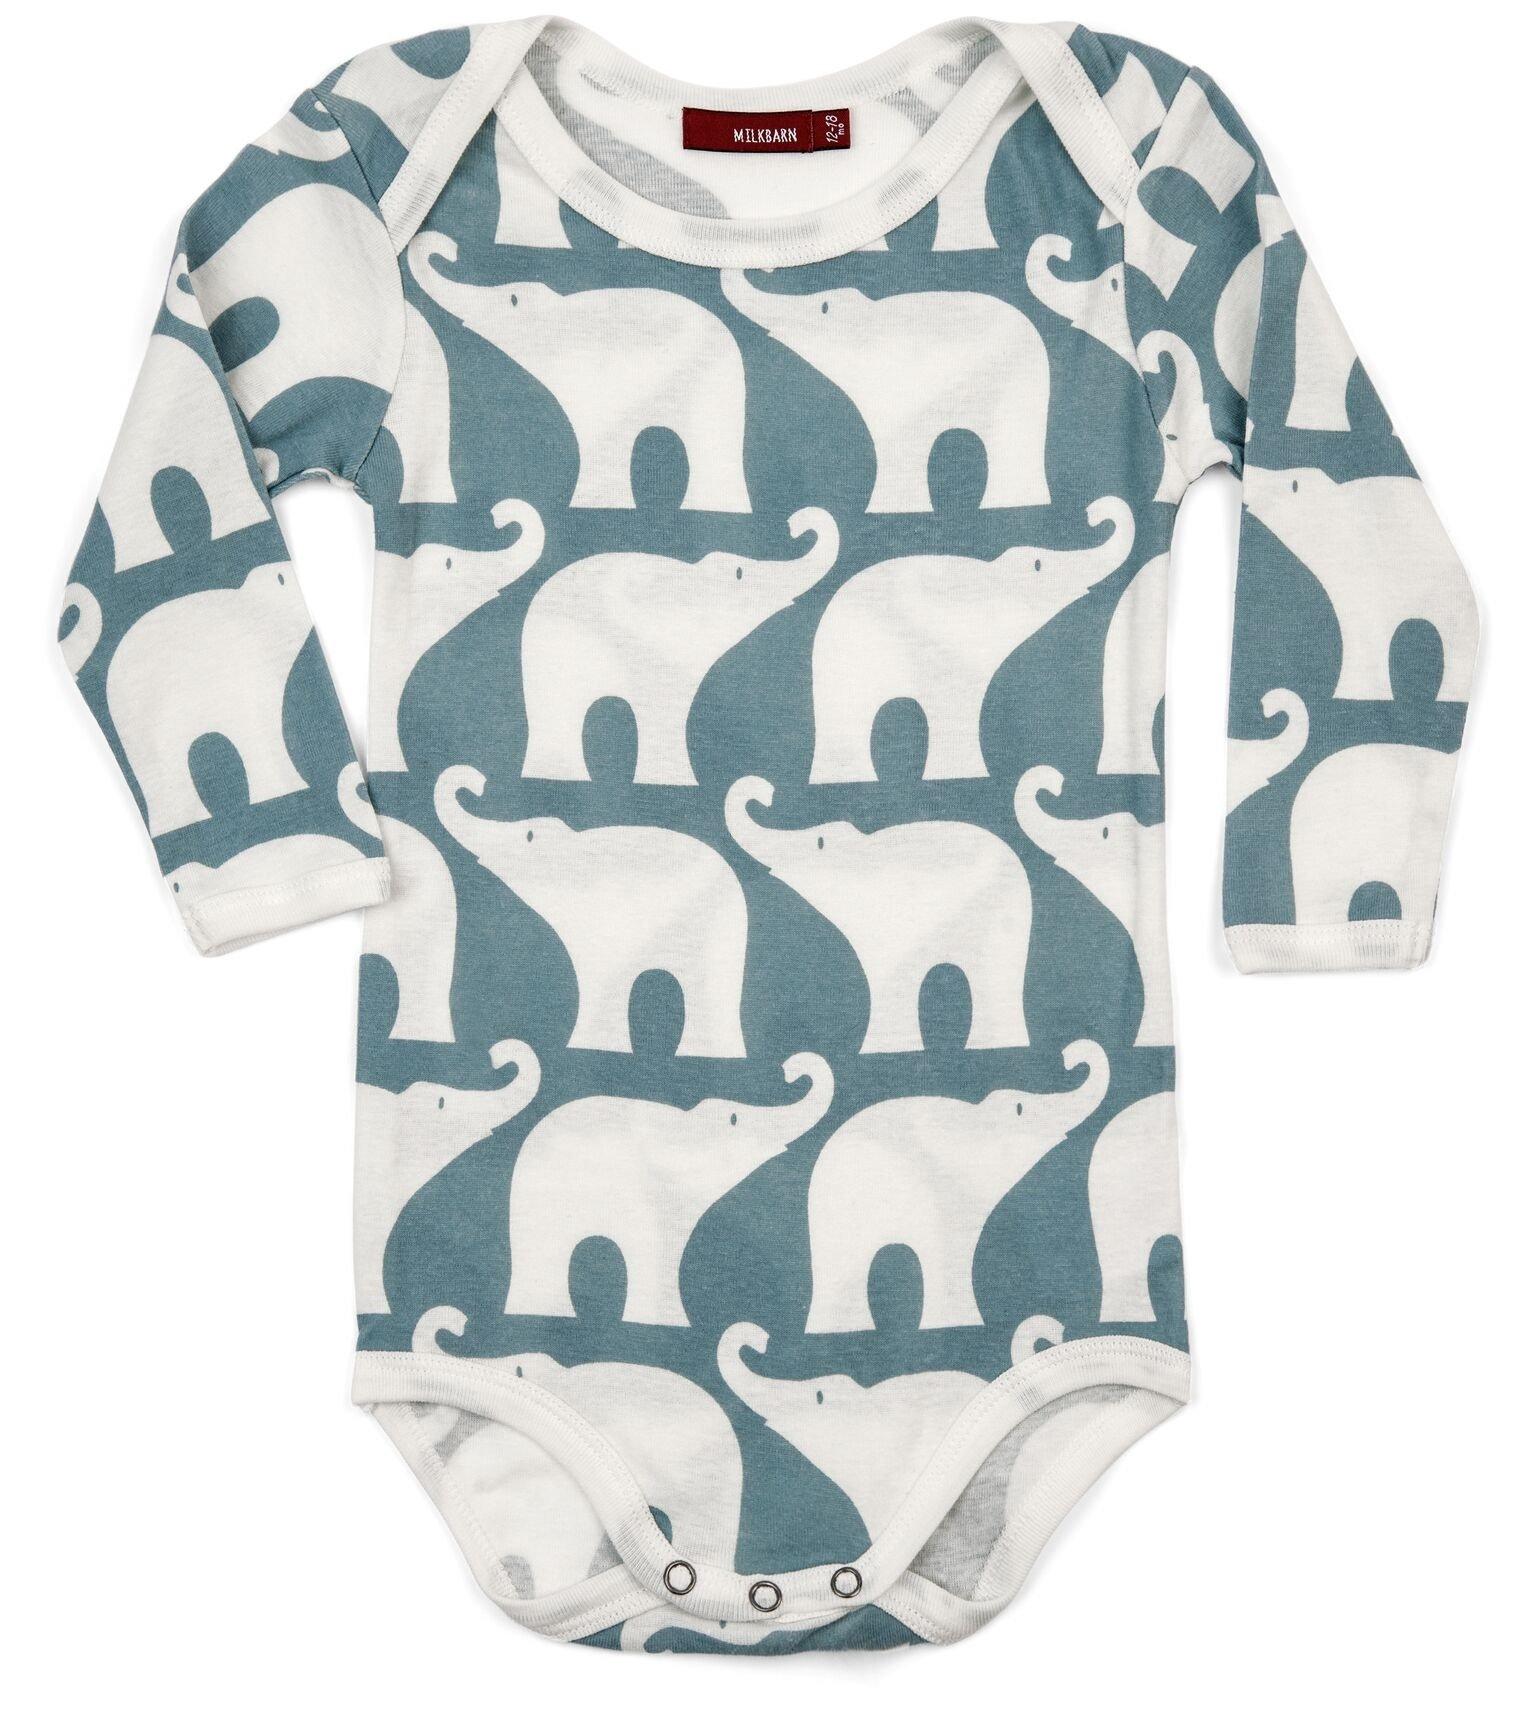 Milkbarn Long Sleeve One Piece Organic Onesie - Blue Elephant (6-12 month)